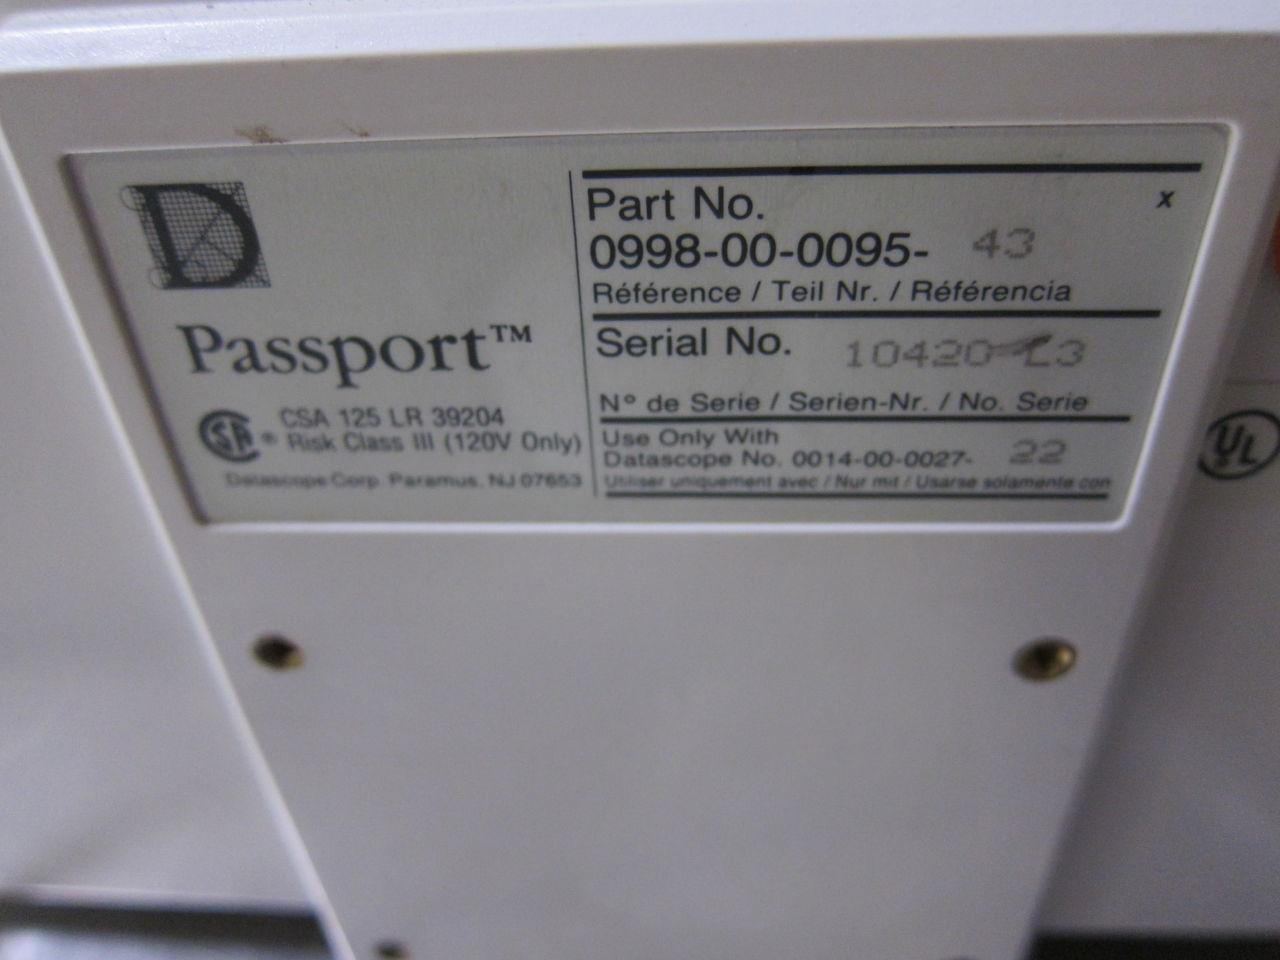 DATASCOPE Passport EL Monitor